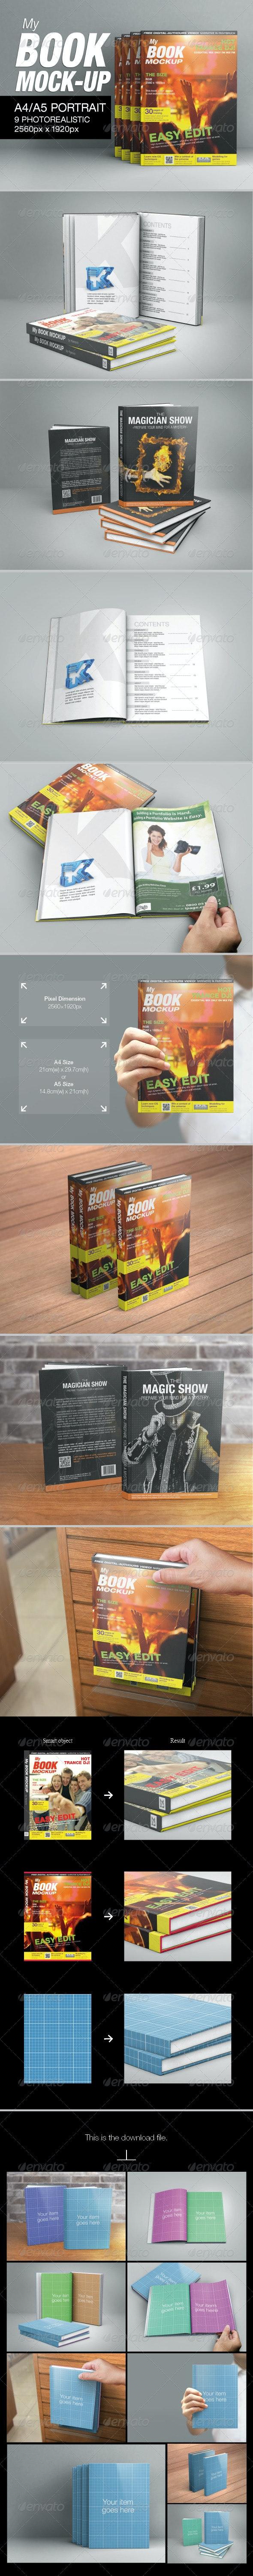 My Book A4 Mock-up - Books Print